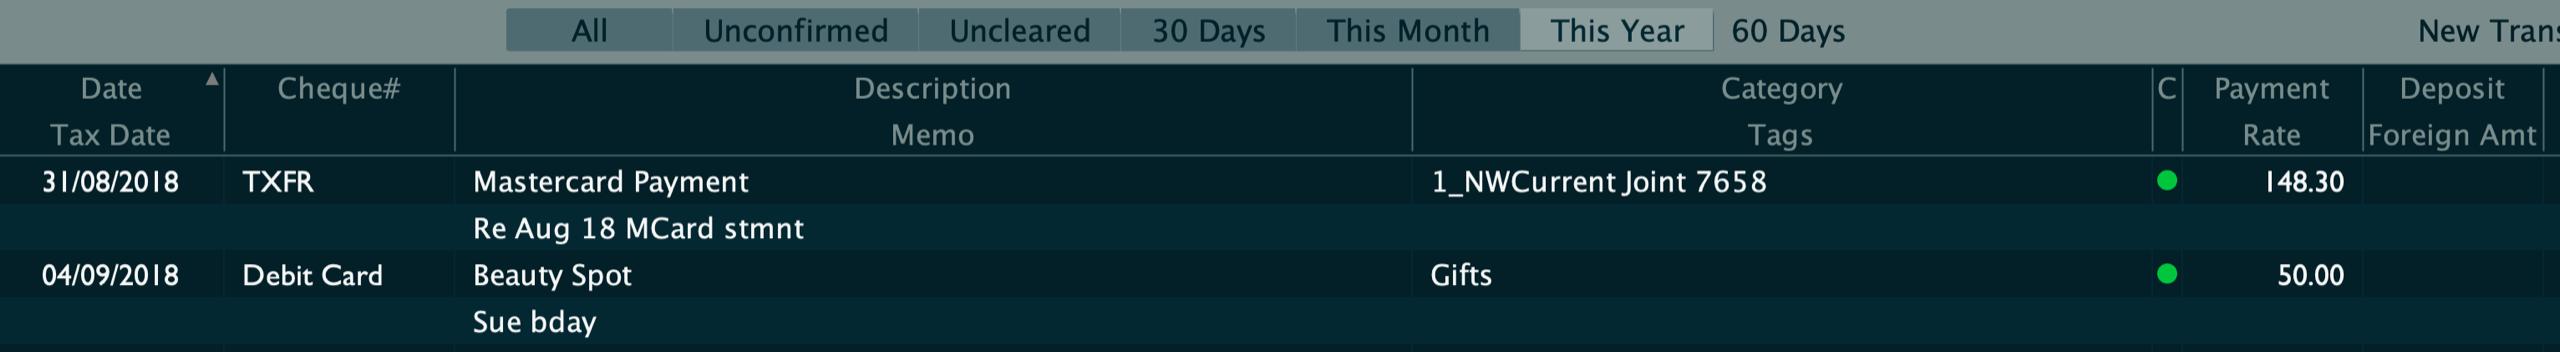 Register_modified_dark_theme